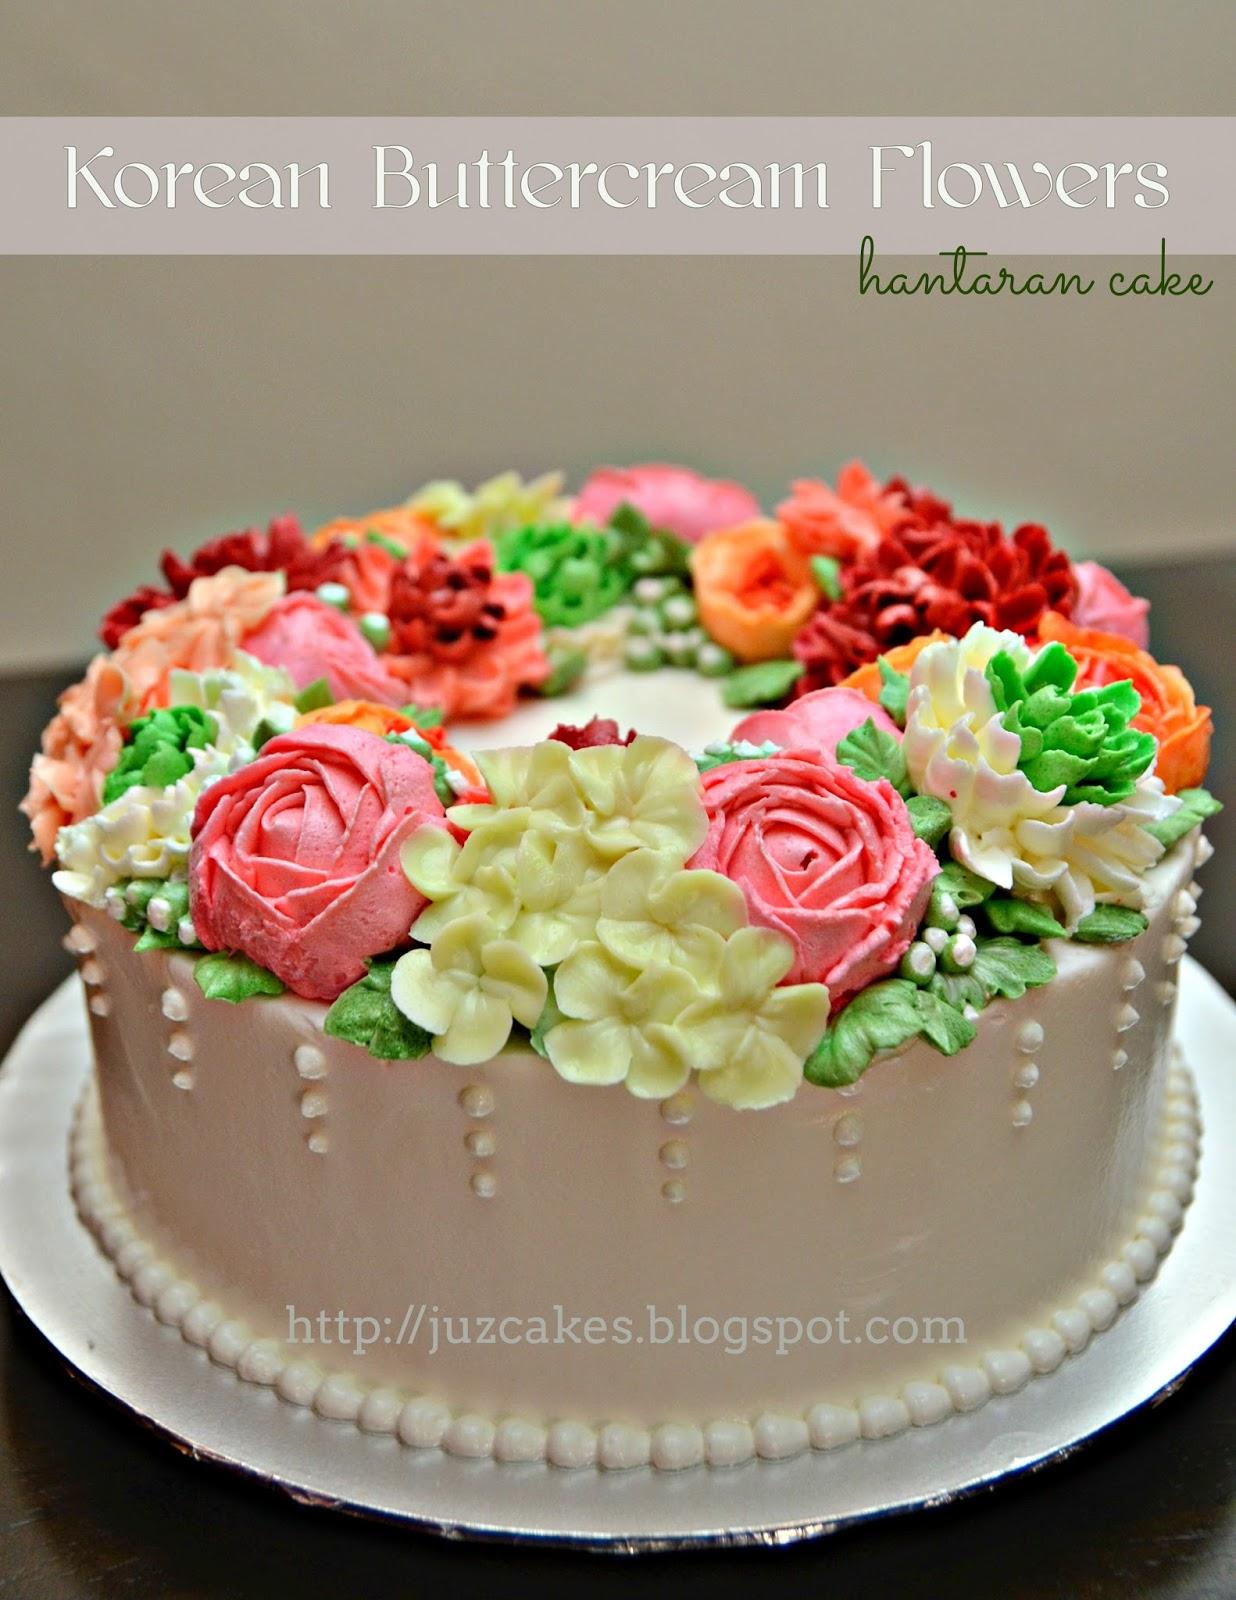 JUZCAKES: Korean Buttercream Flowers - Engagement Cake